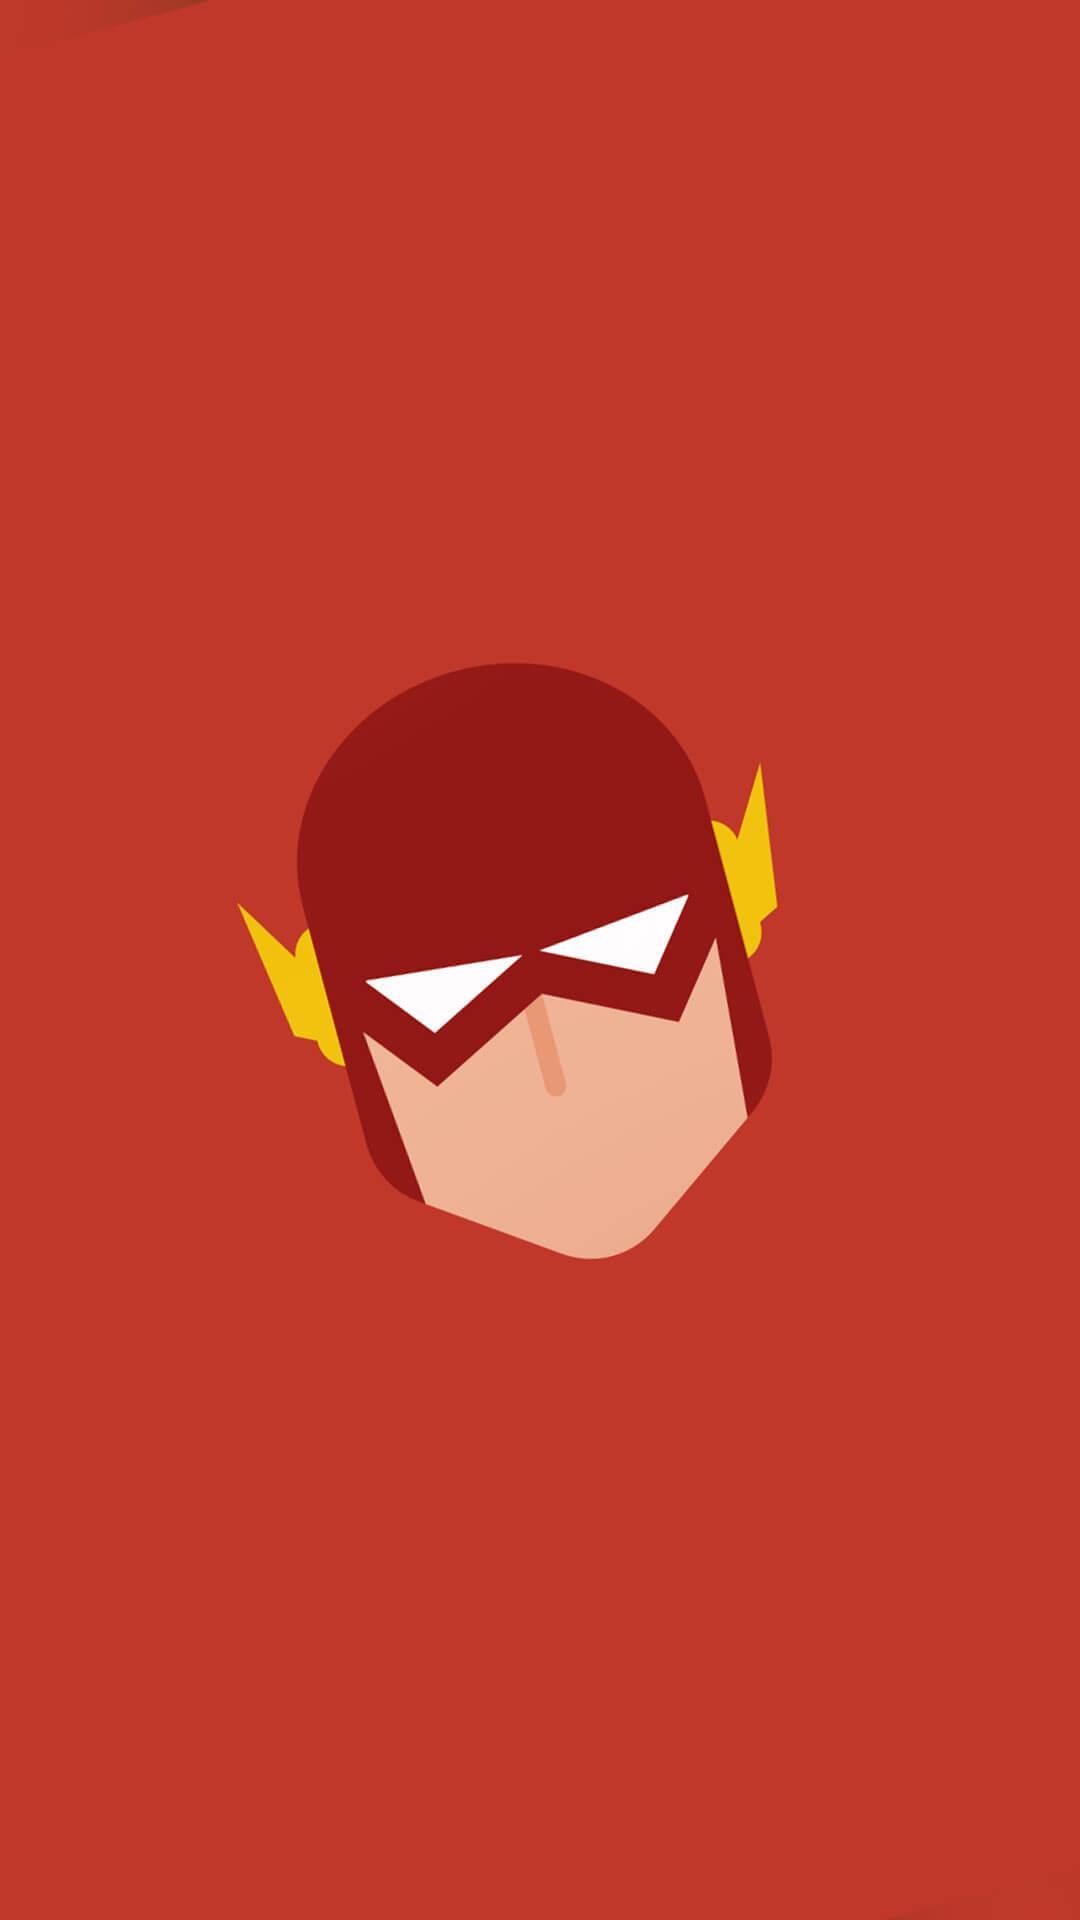 Superhero Logo iPhone Wallpapers - Top Free Superhero Logo ...